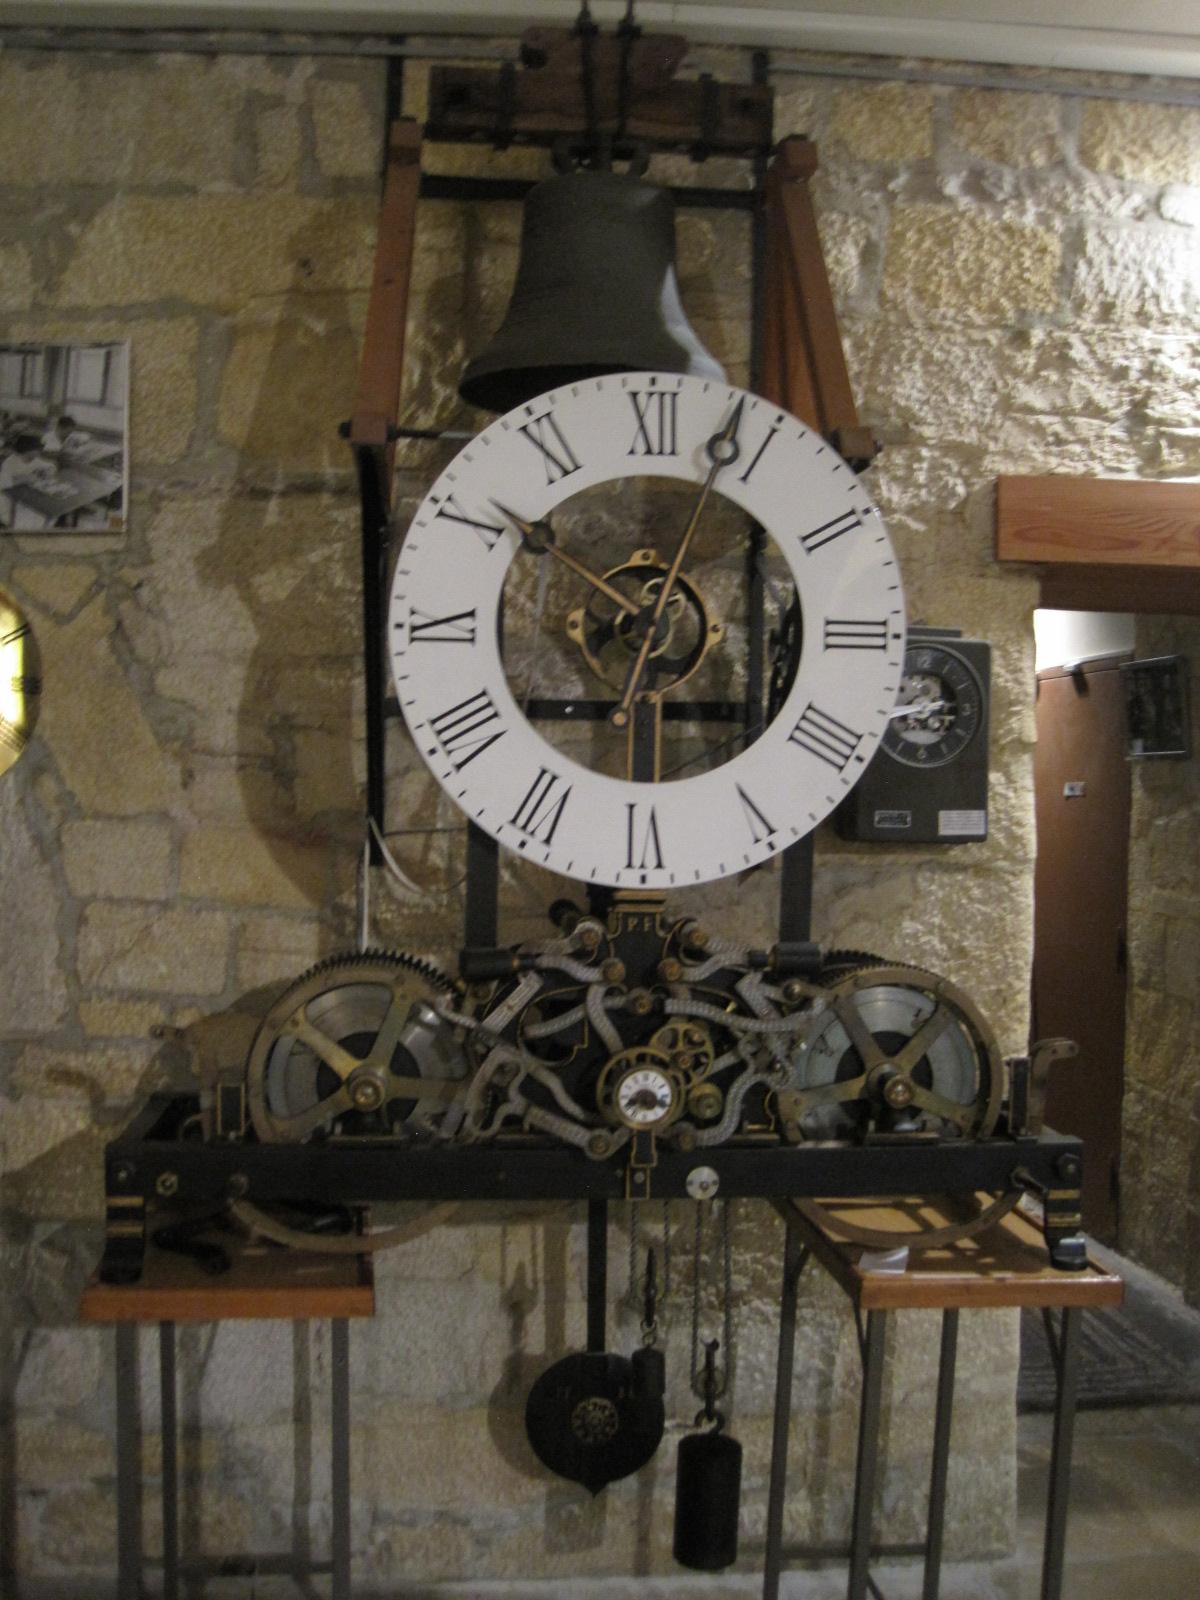 Calendar Wallpaper With Clock : Horloge de clocher — wikipédia